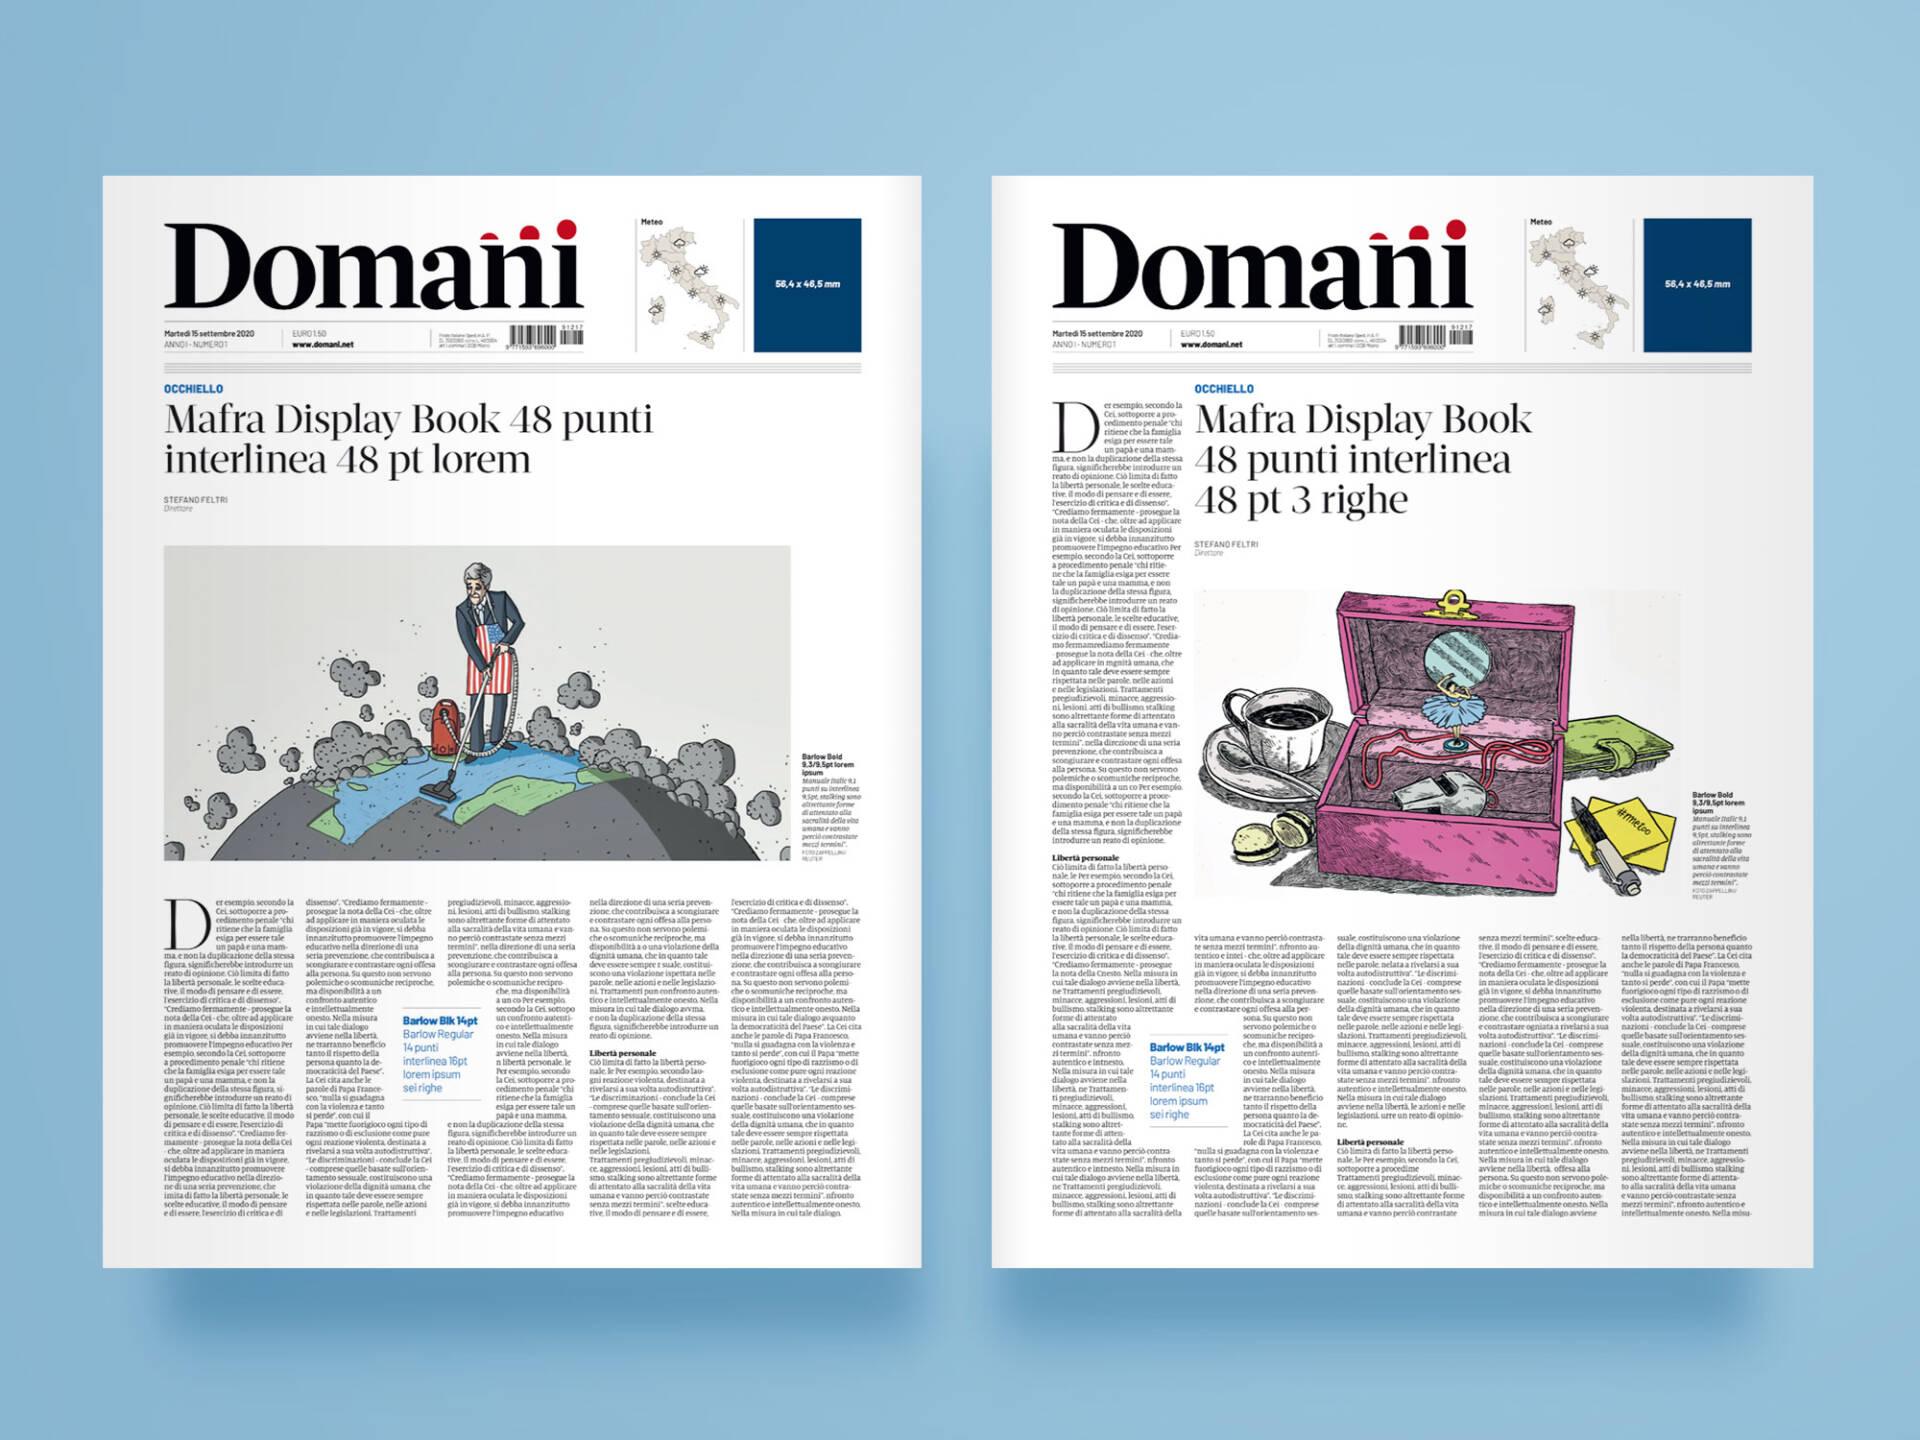 Domani_Print_Frontpage_Wenceslau_News_Design06